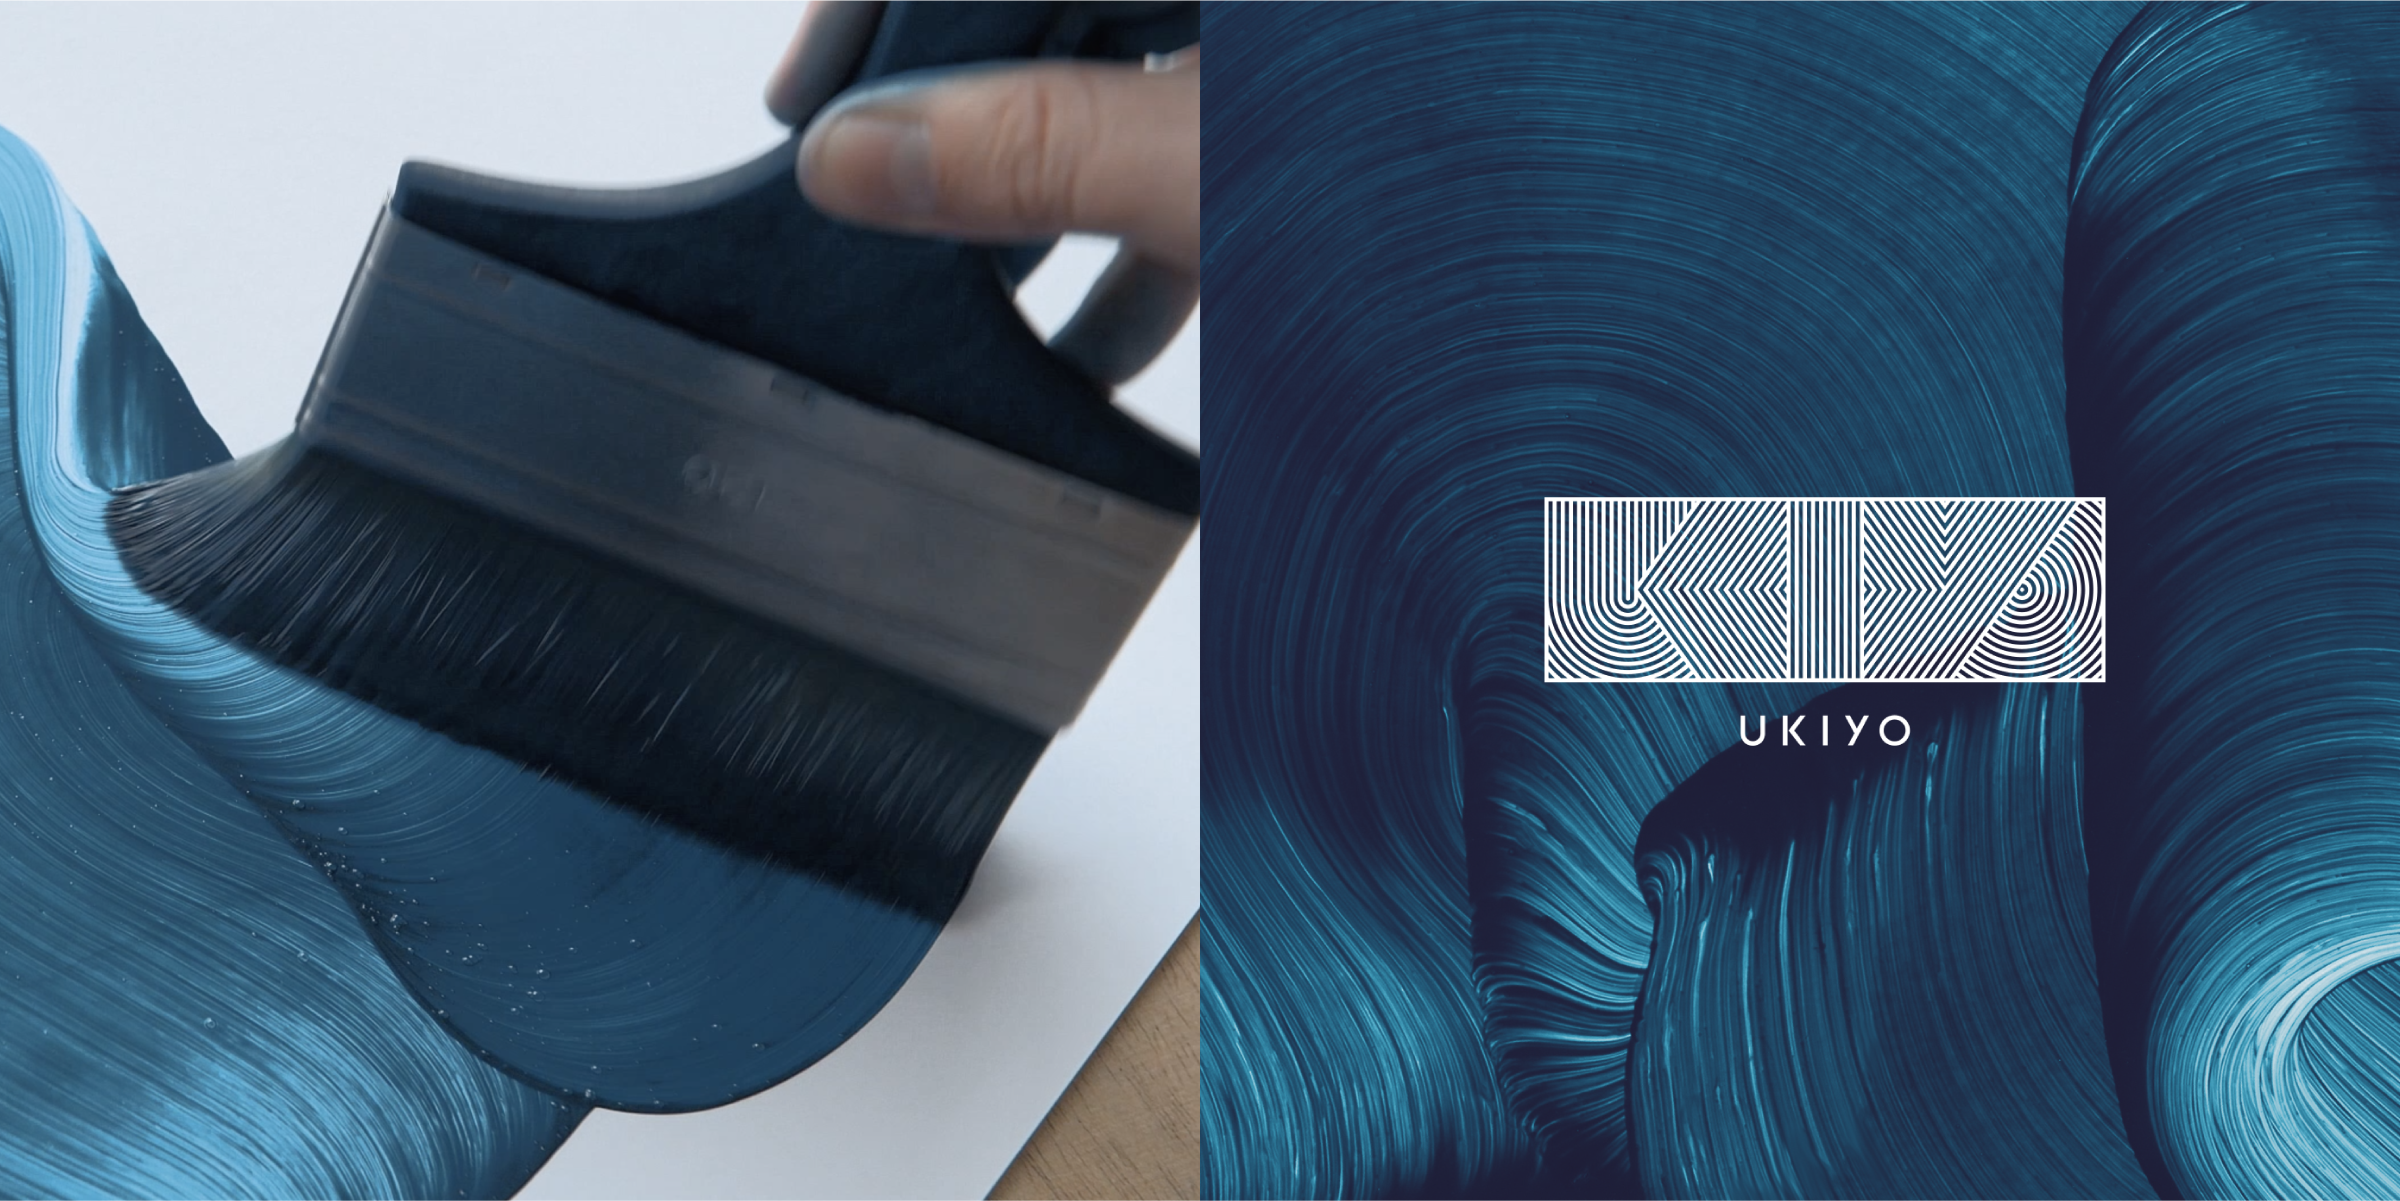 UKIYO Brandworld - Oil Paint on Gloss by Hawk & Handsaw